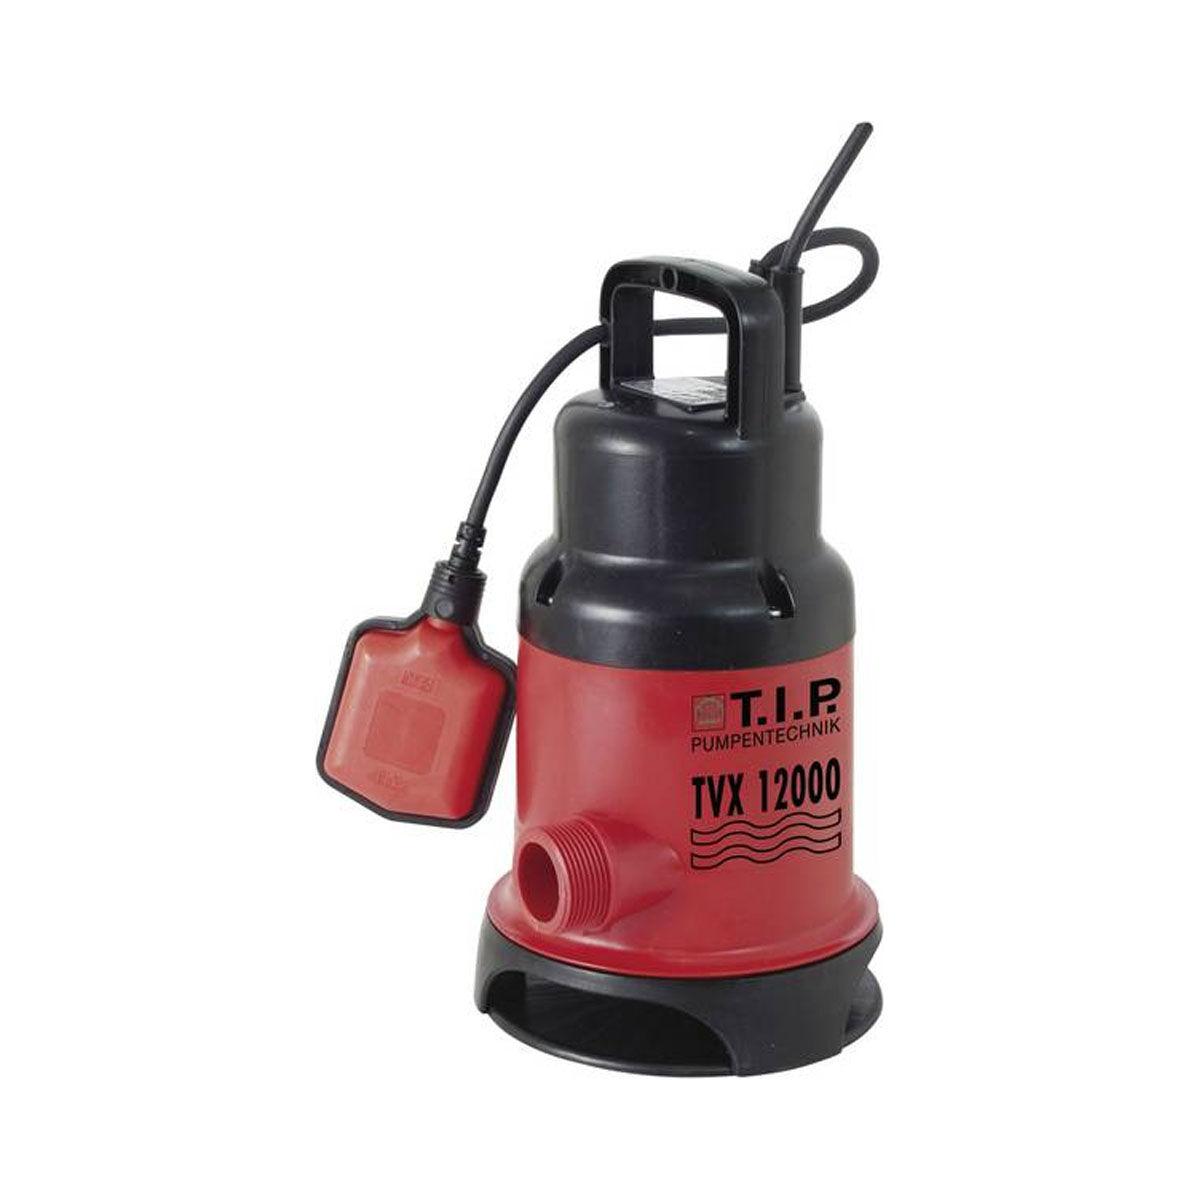 T.I.P. TVX 12000 Pompe de relevage